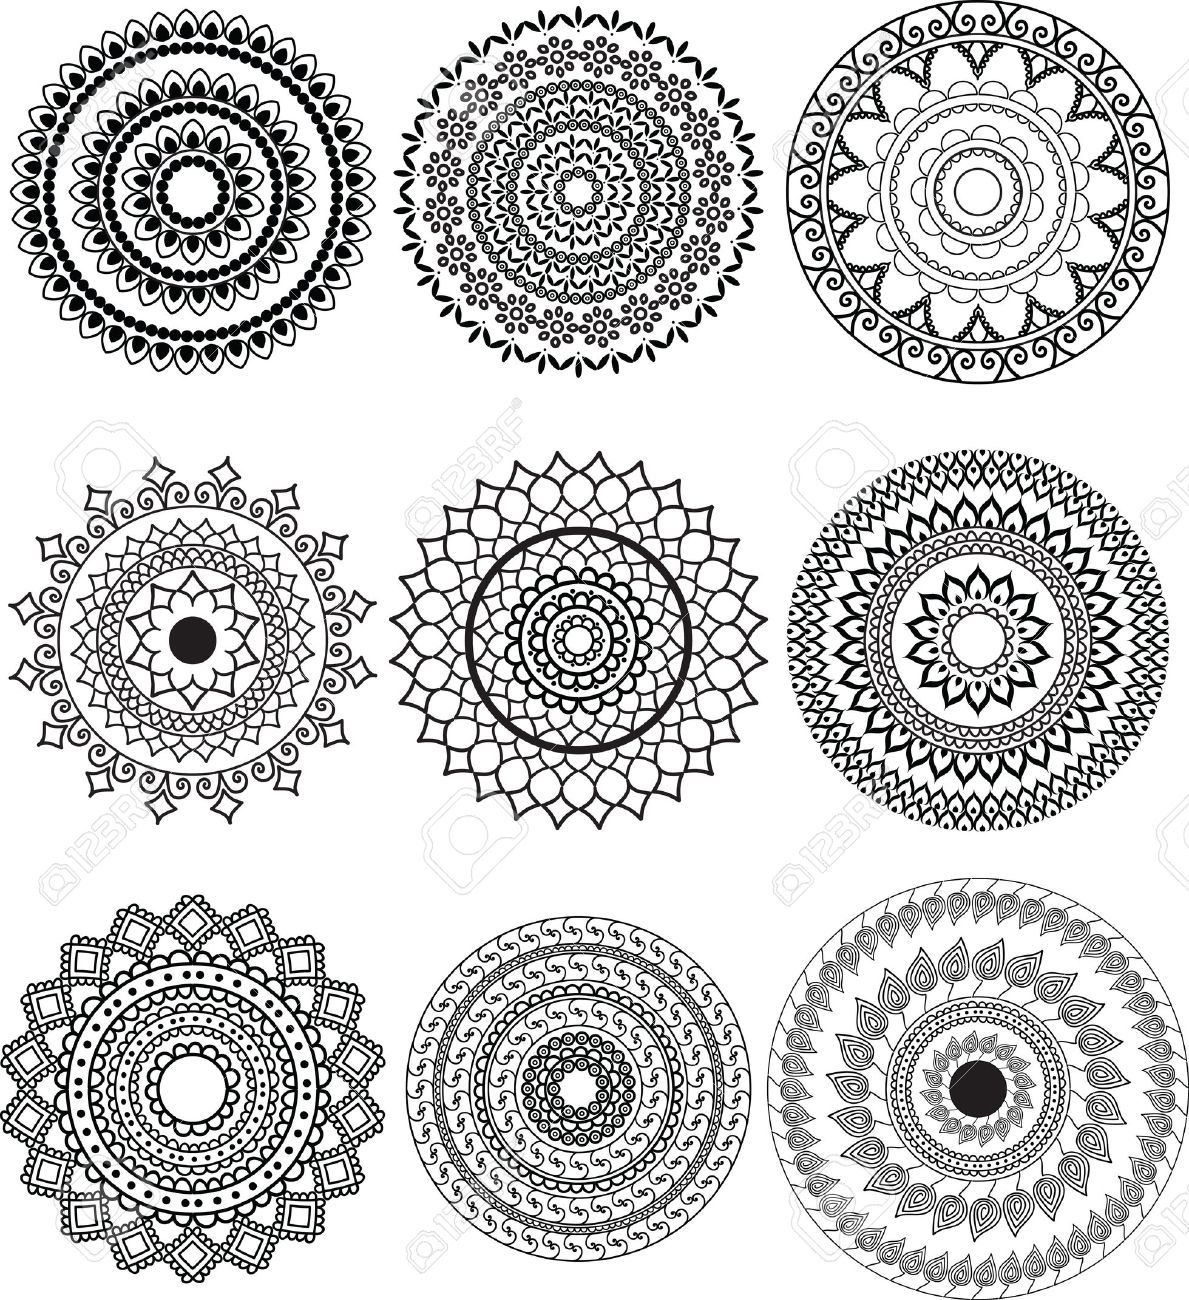 Henna Design Outline: Round Mandala Outline - Google Search